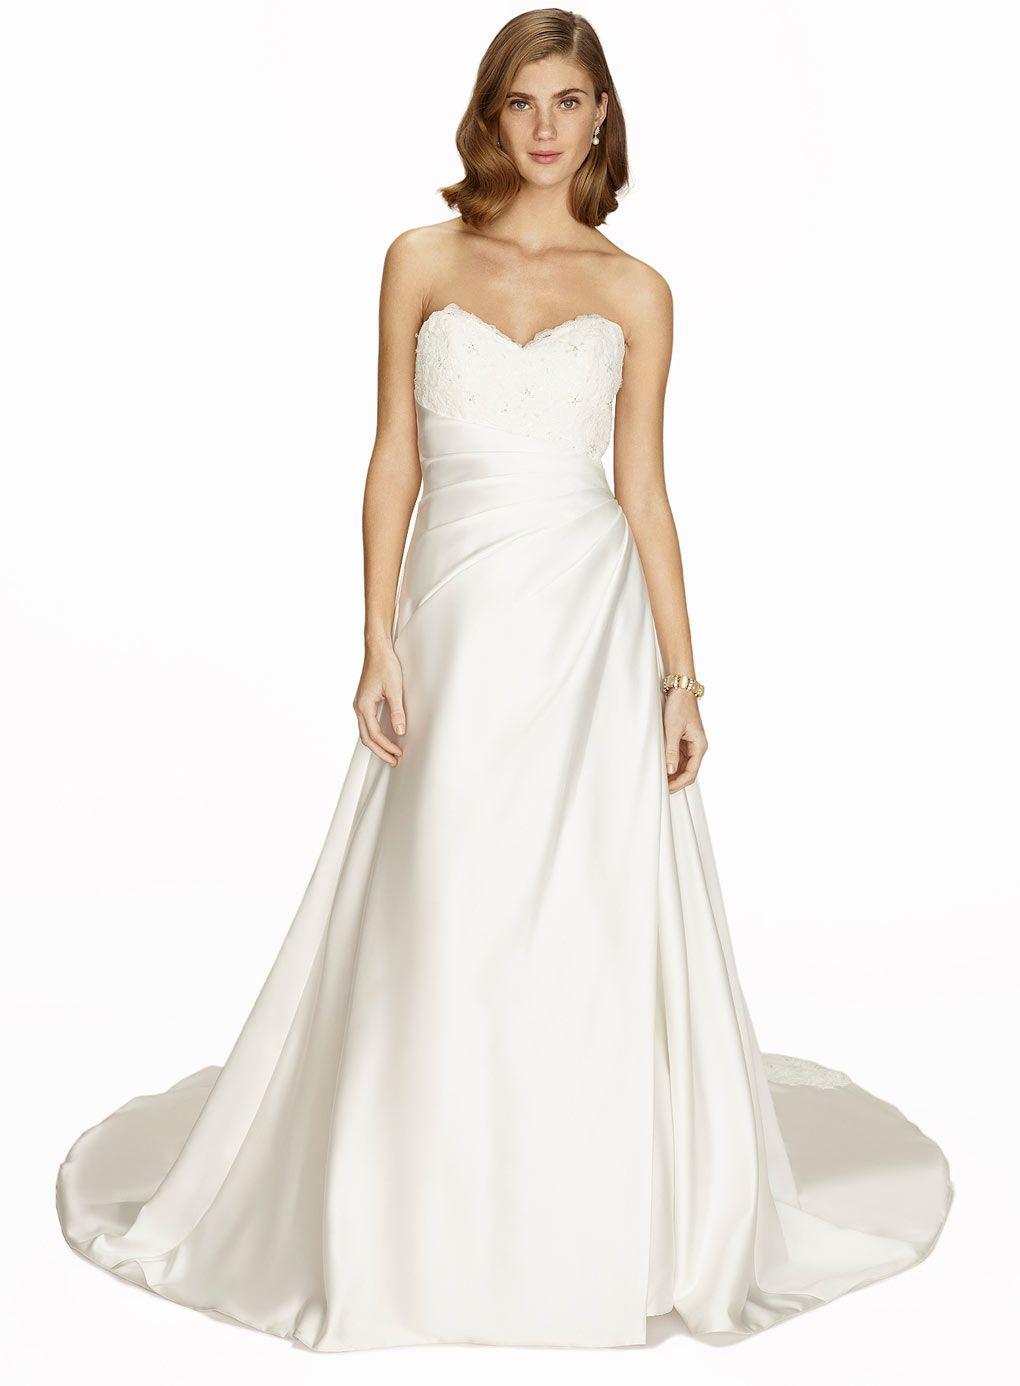 Celeste bridal dress httpweddingheartbhs wedding celeste bridal dress httpweddingheartbhs ombrellifo Choice Image